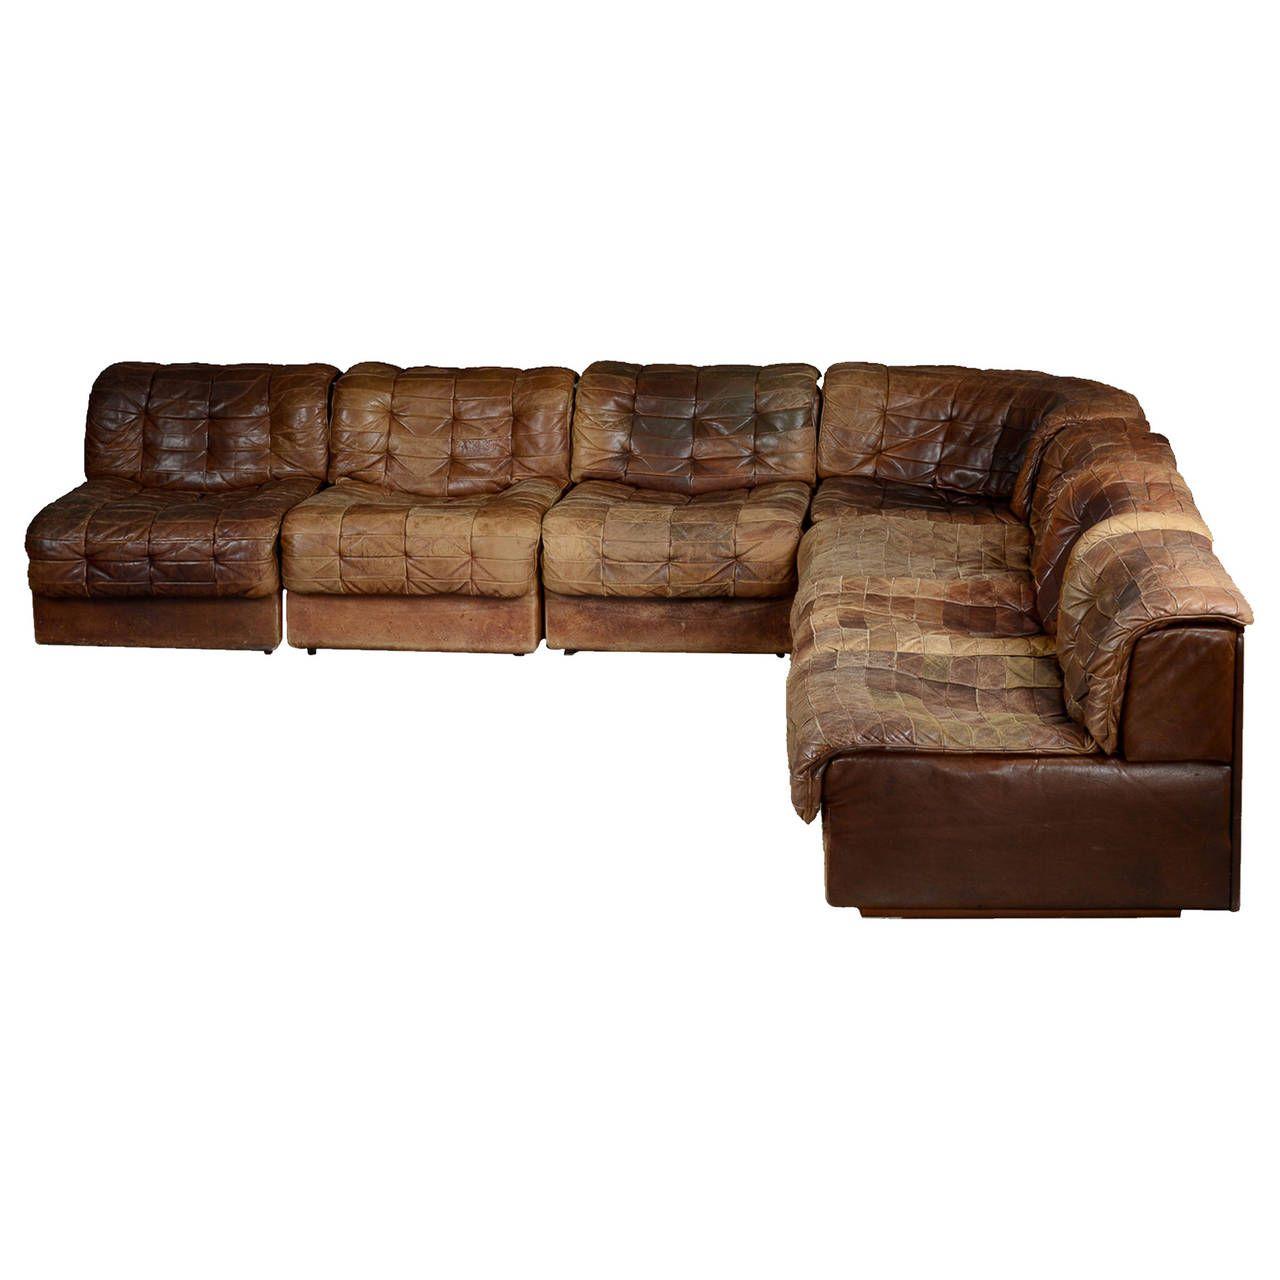 Seven section leather patchwork sofa by de sede patchwork seven section leather patchwork sofa by de sede parisarafo Image collections